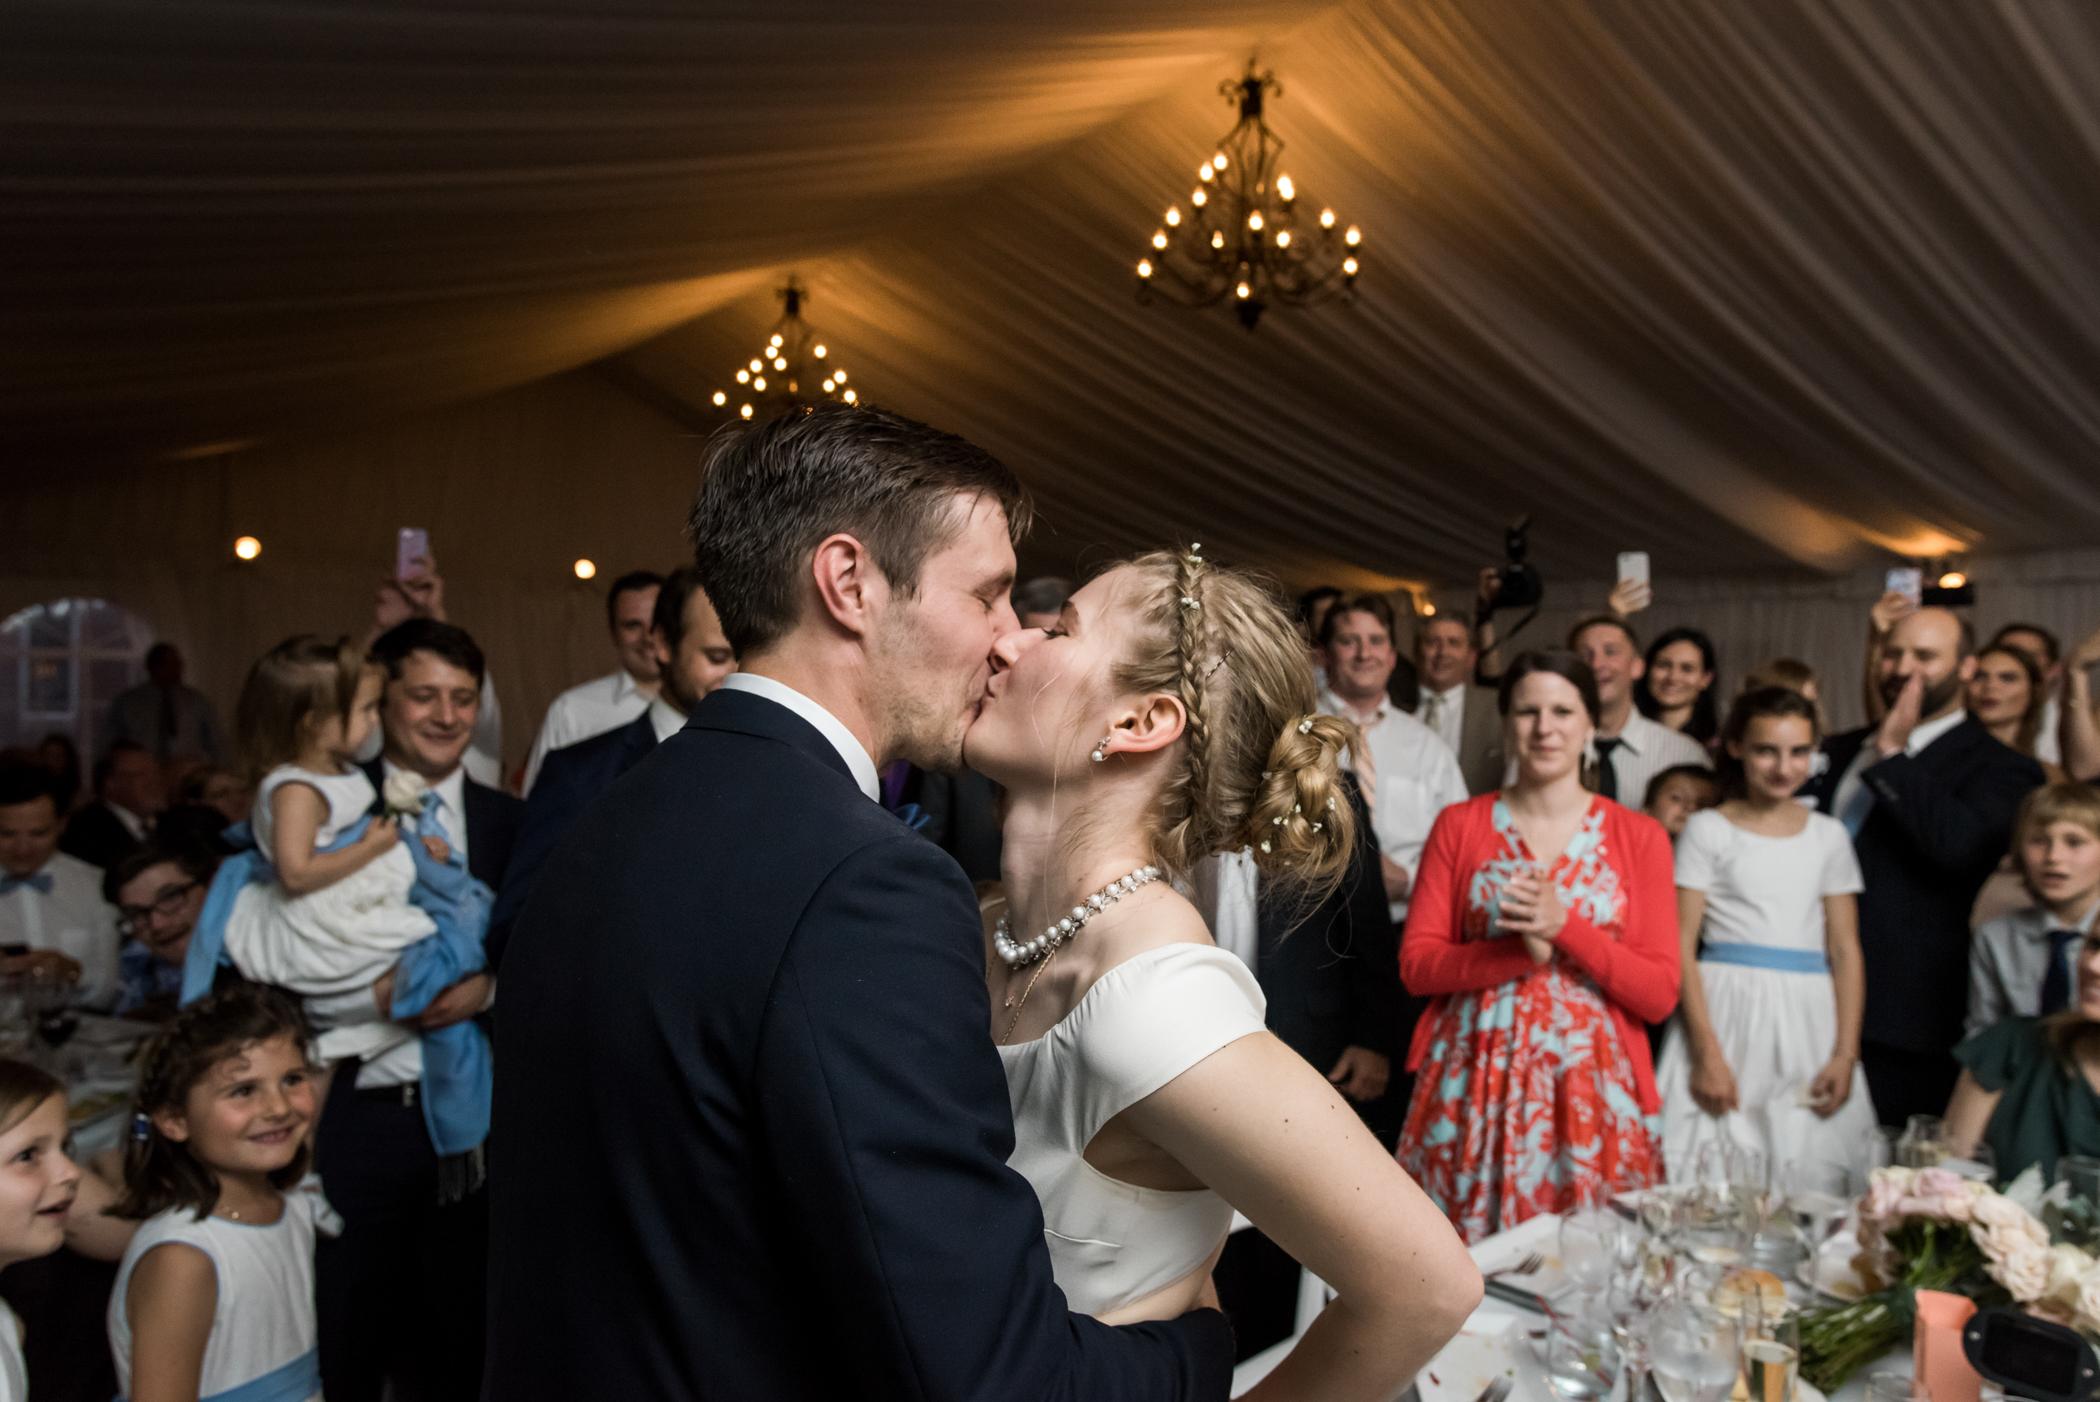 Stefy Hilmer Photography-bride and groom kissing at wedding reception at Lyndhurst Castle.jpg